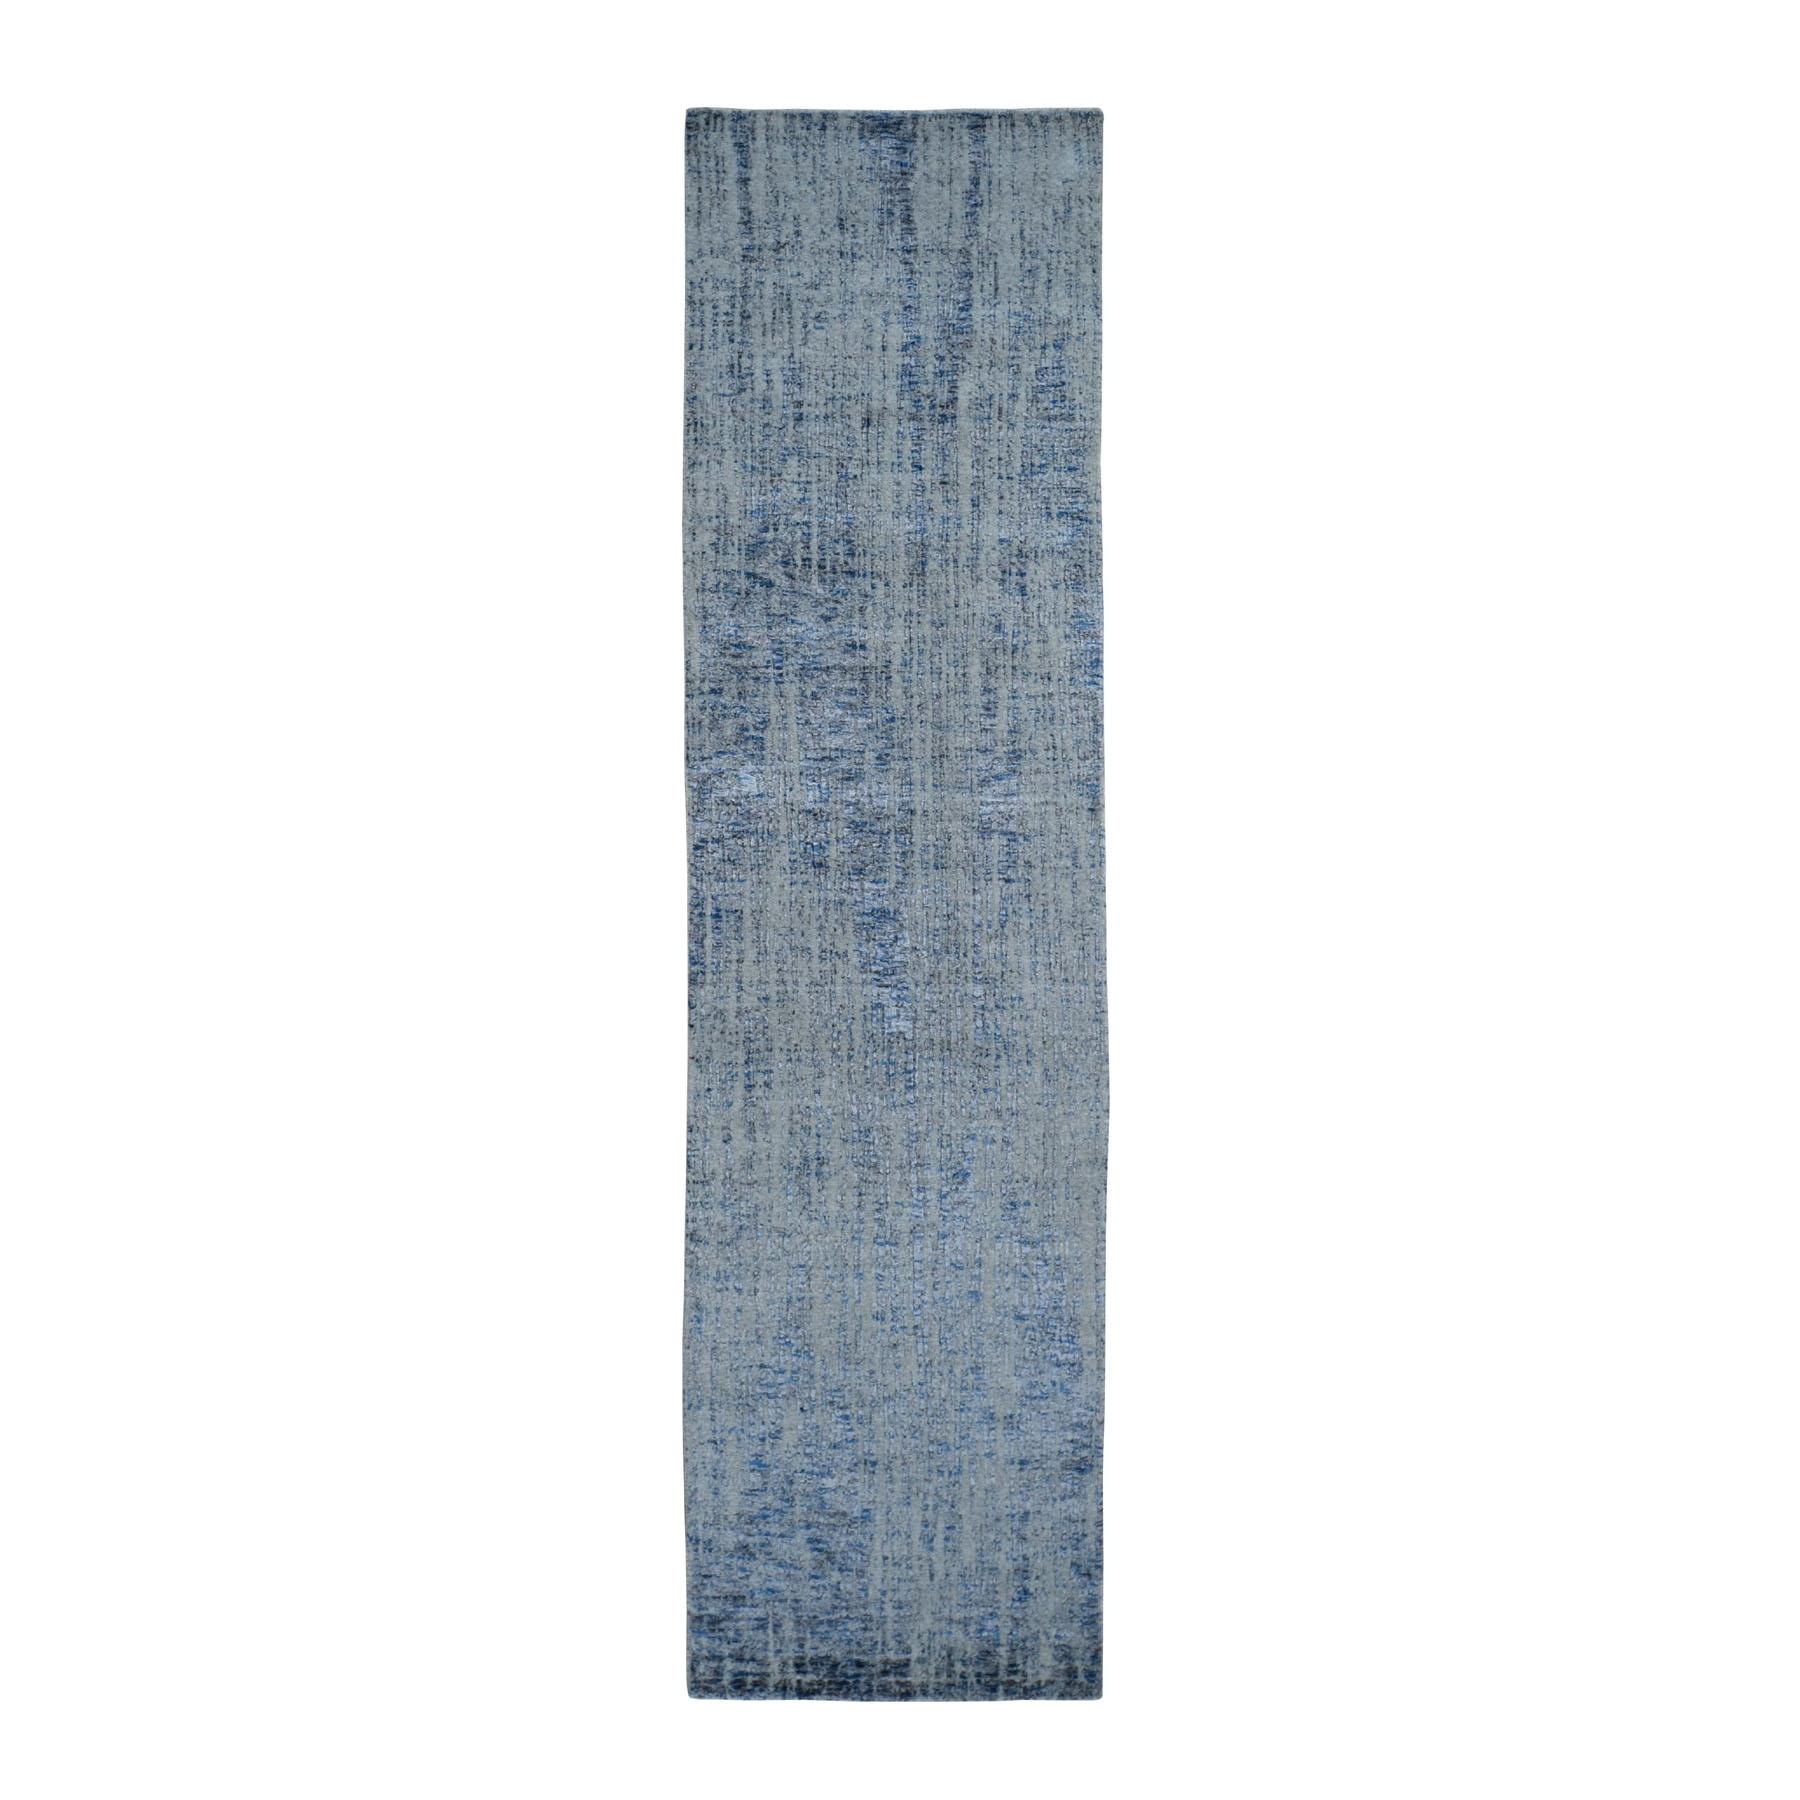 "2'6""x9'9"" Gray Fine jacquard Hand-Loomed Runner Modern Wool And Silk Oriental Rug"